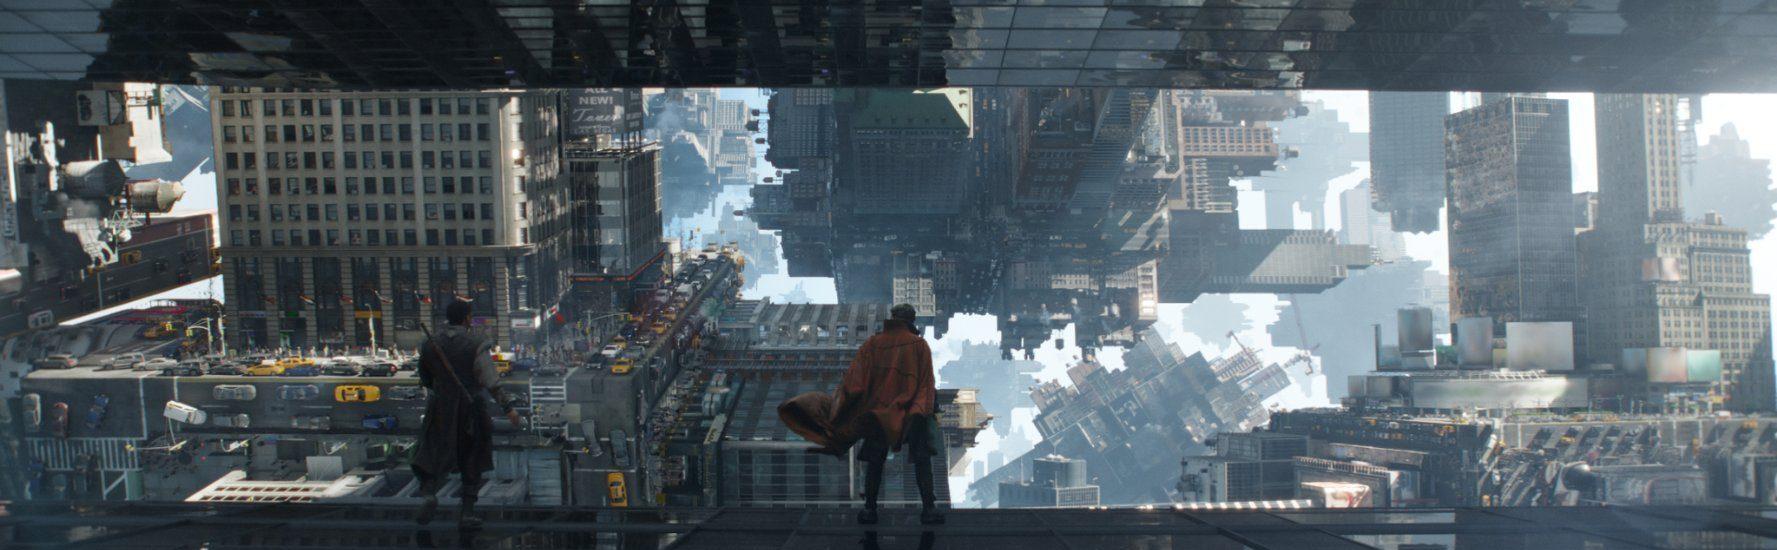 Doctor Strange (Doctor Extraño) Marvel